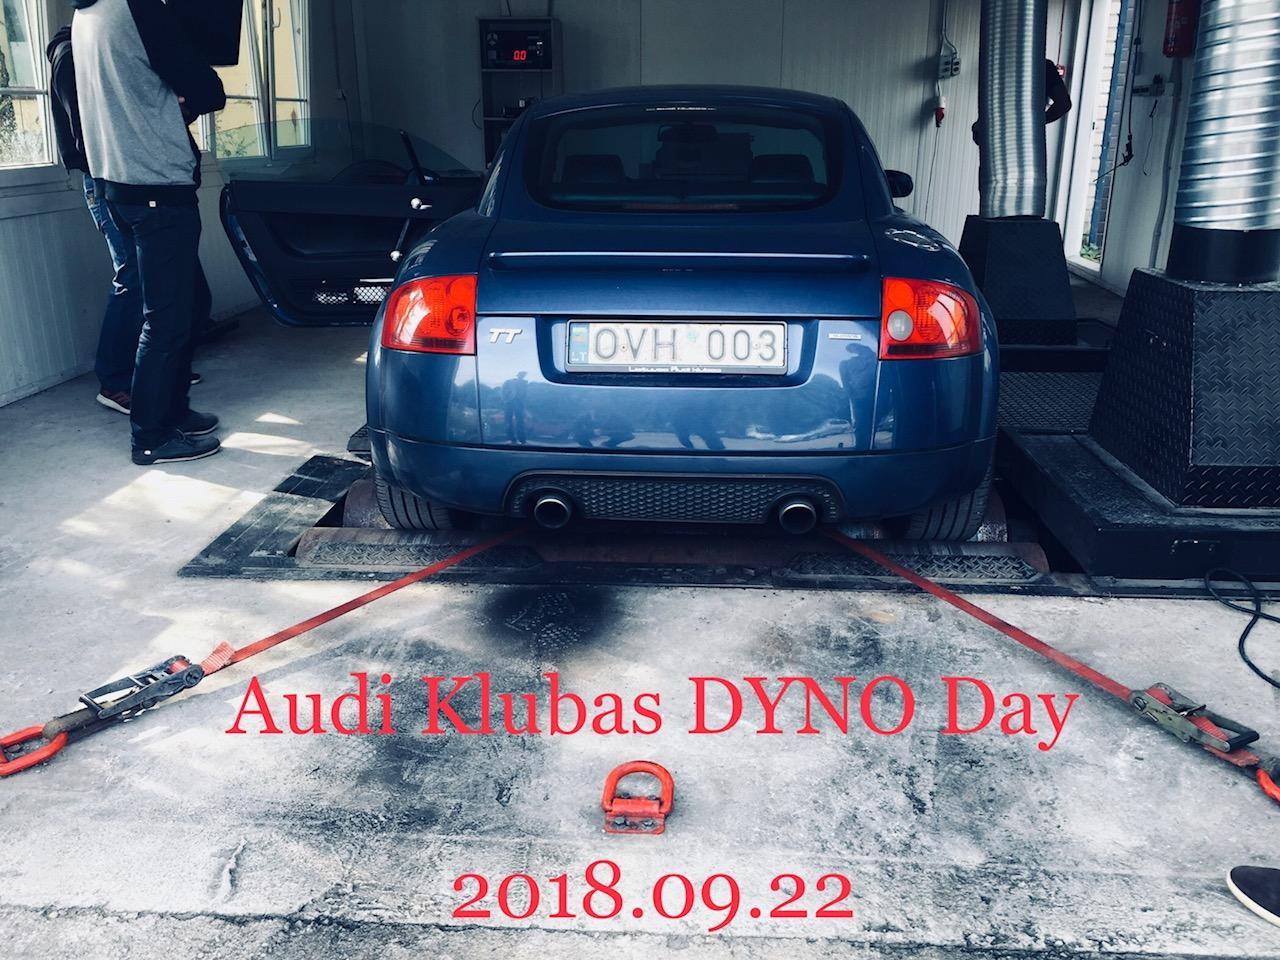 Audi Klubas Dyno Day 2018